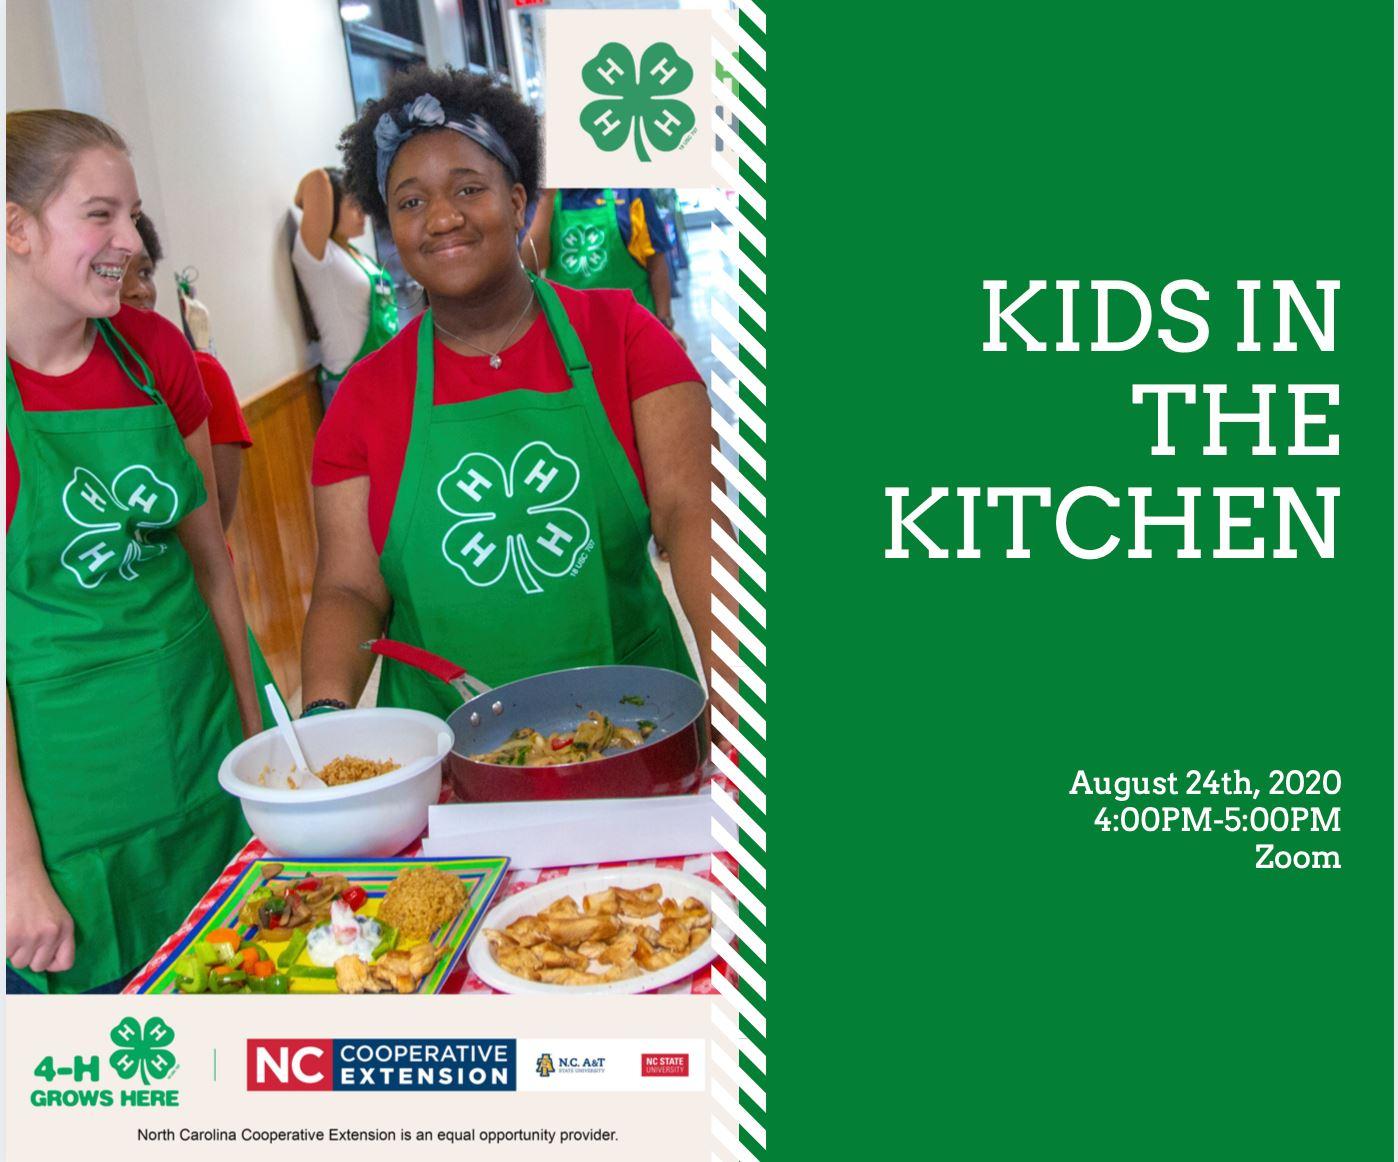 4-H teens kids in the kitchen